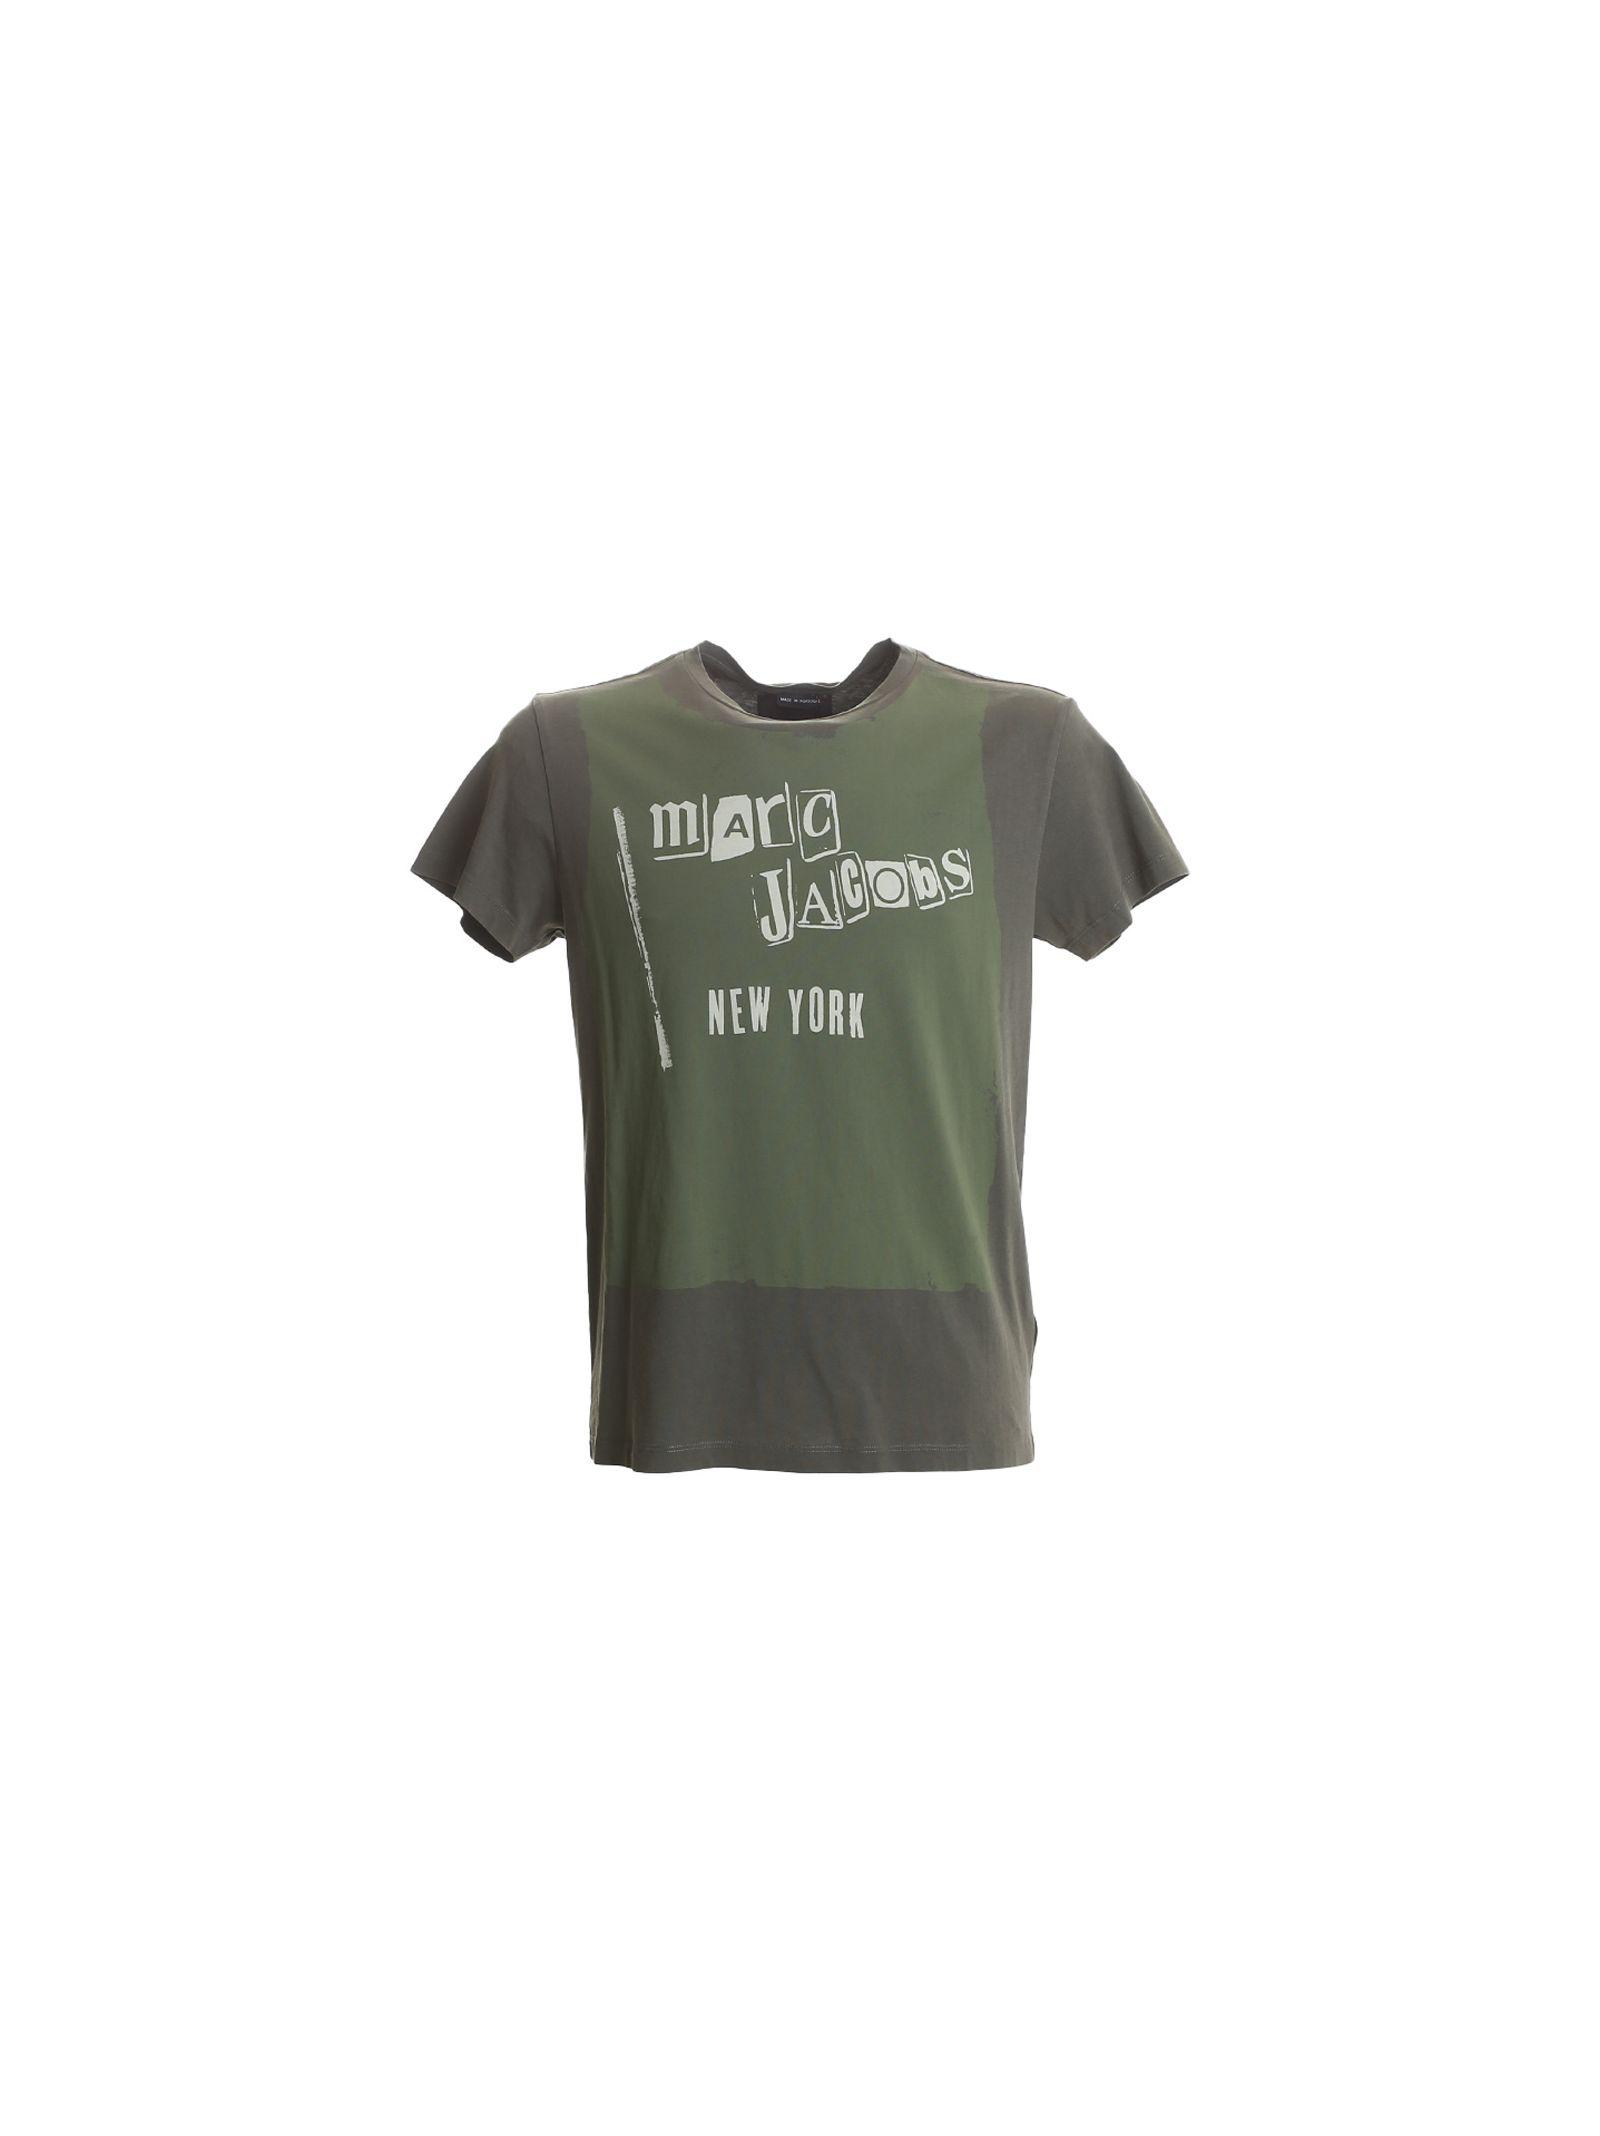 marc jacobs male 227429 military green cotton tshirt